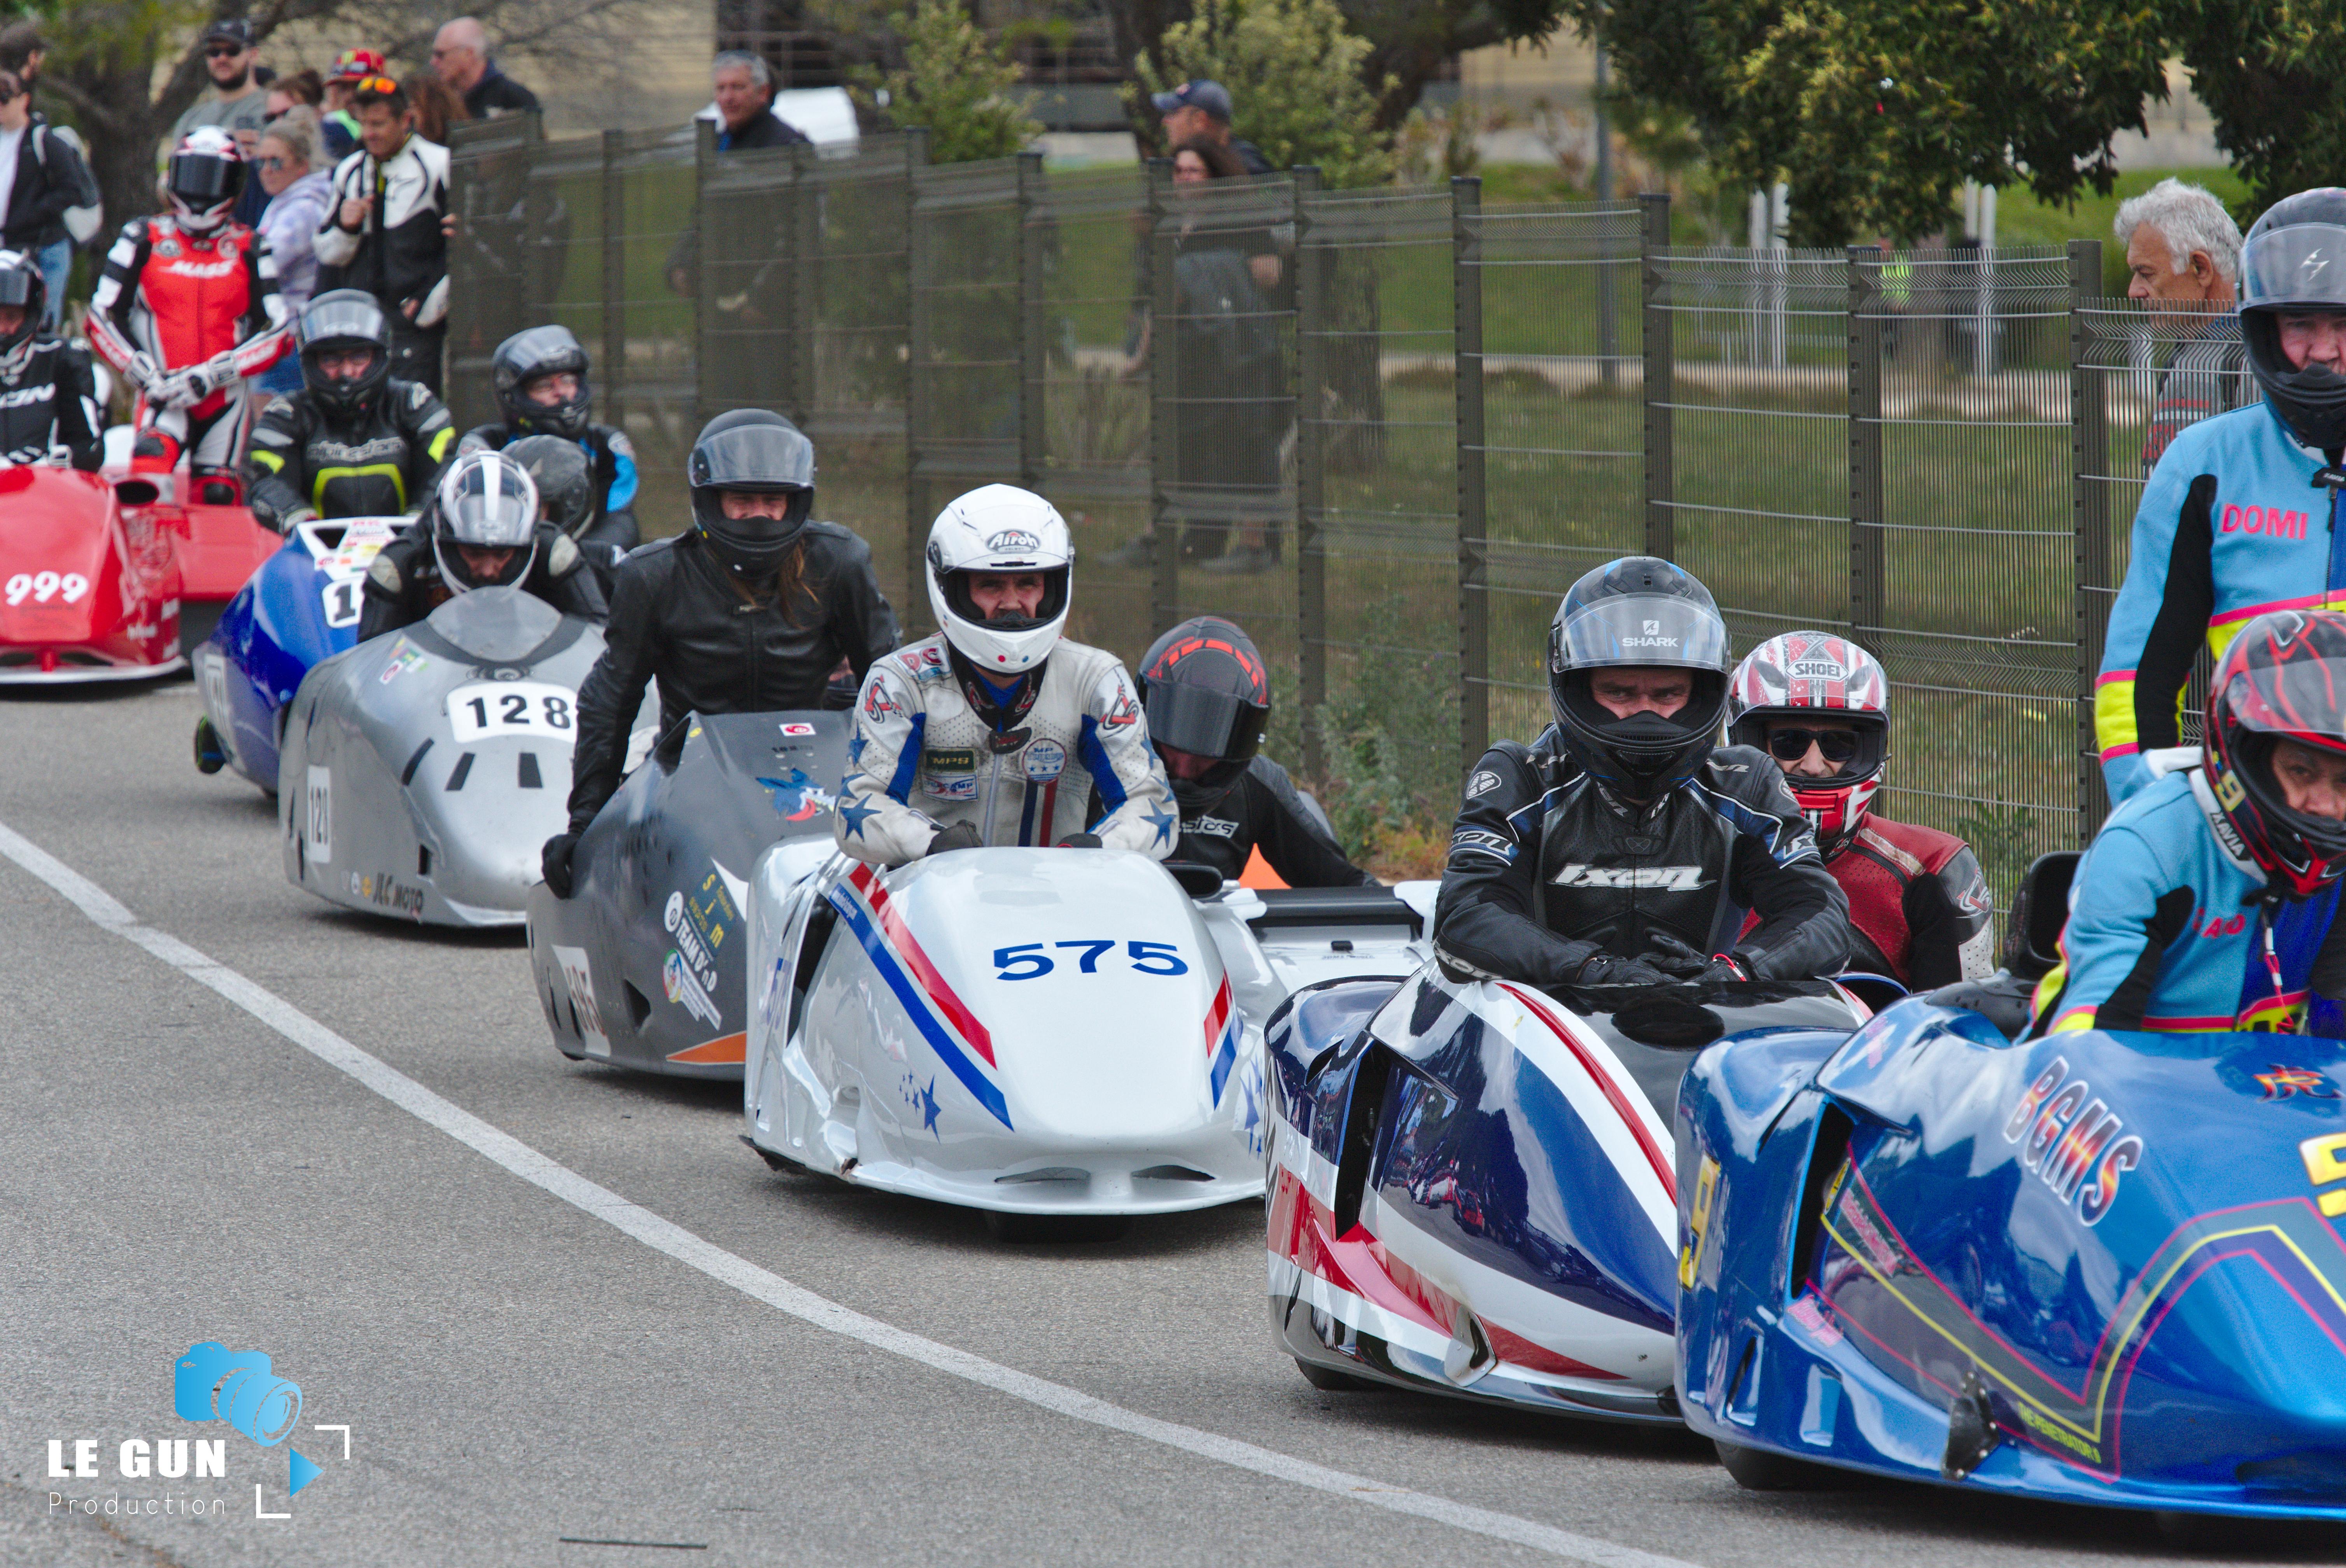 Sunday Ride Classic 10,11 et 12 mai 2019 Circuit Paul Ricard